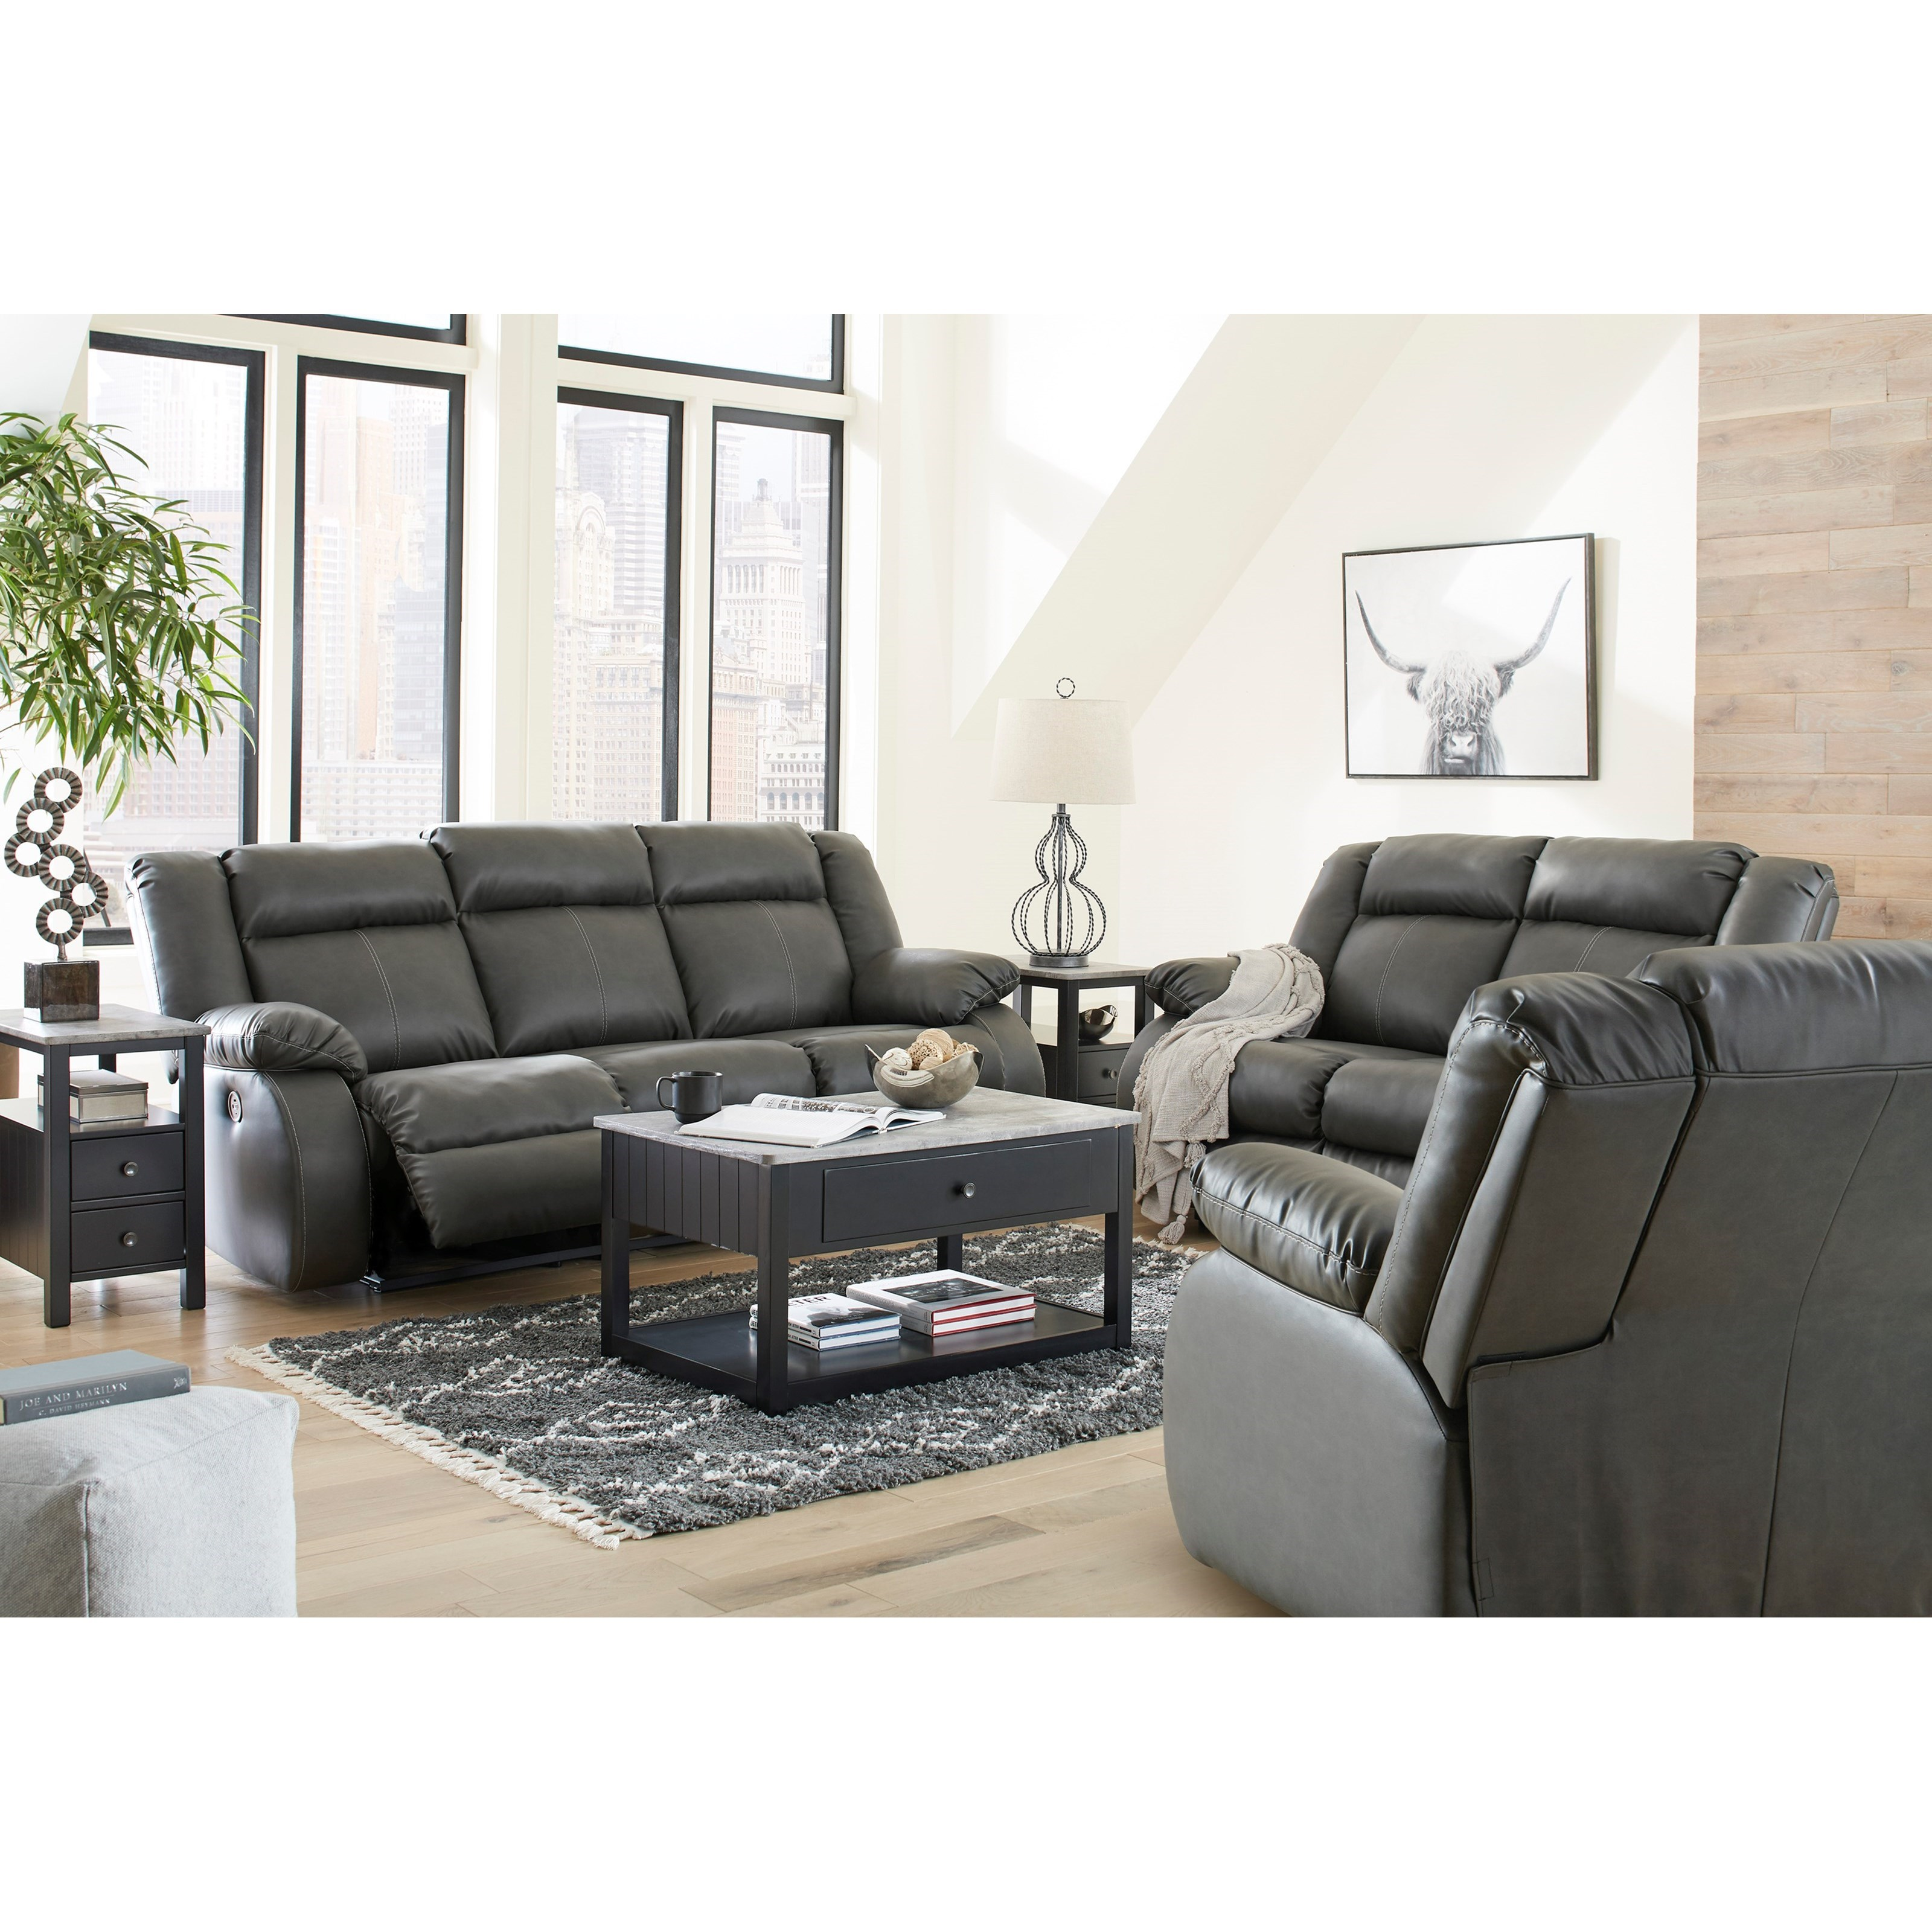 Denoron Sofa, Loveseat and Recliner by Ashley (Signature Design) at Johnny Janosik